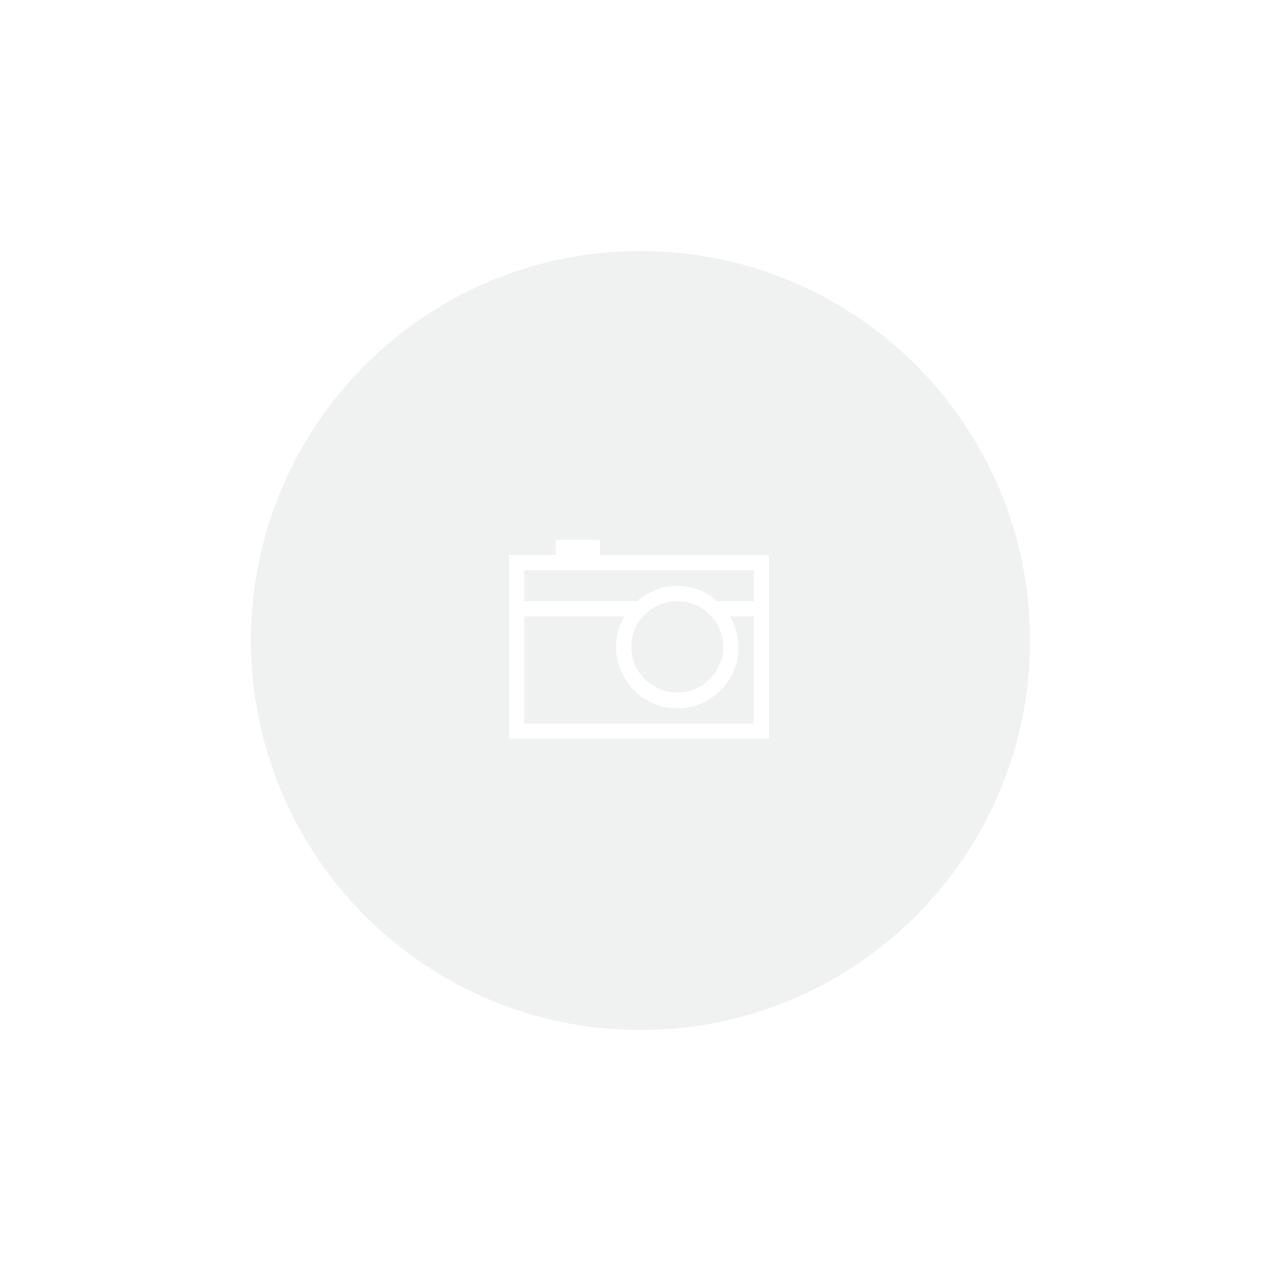 PNEU 27,5X2.35 CHAOYANG H-5136 GLADIADOR ENDURO/DH